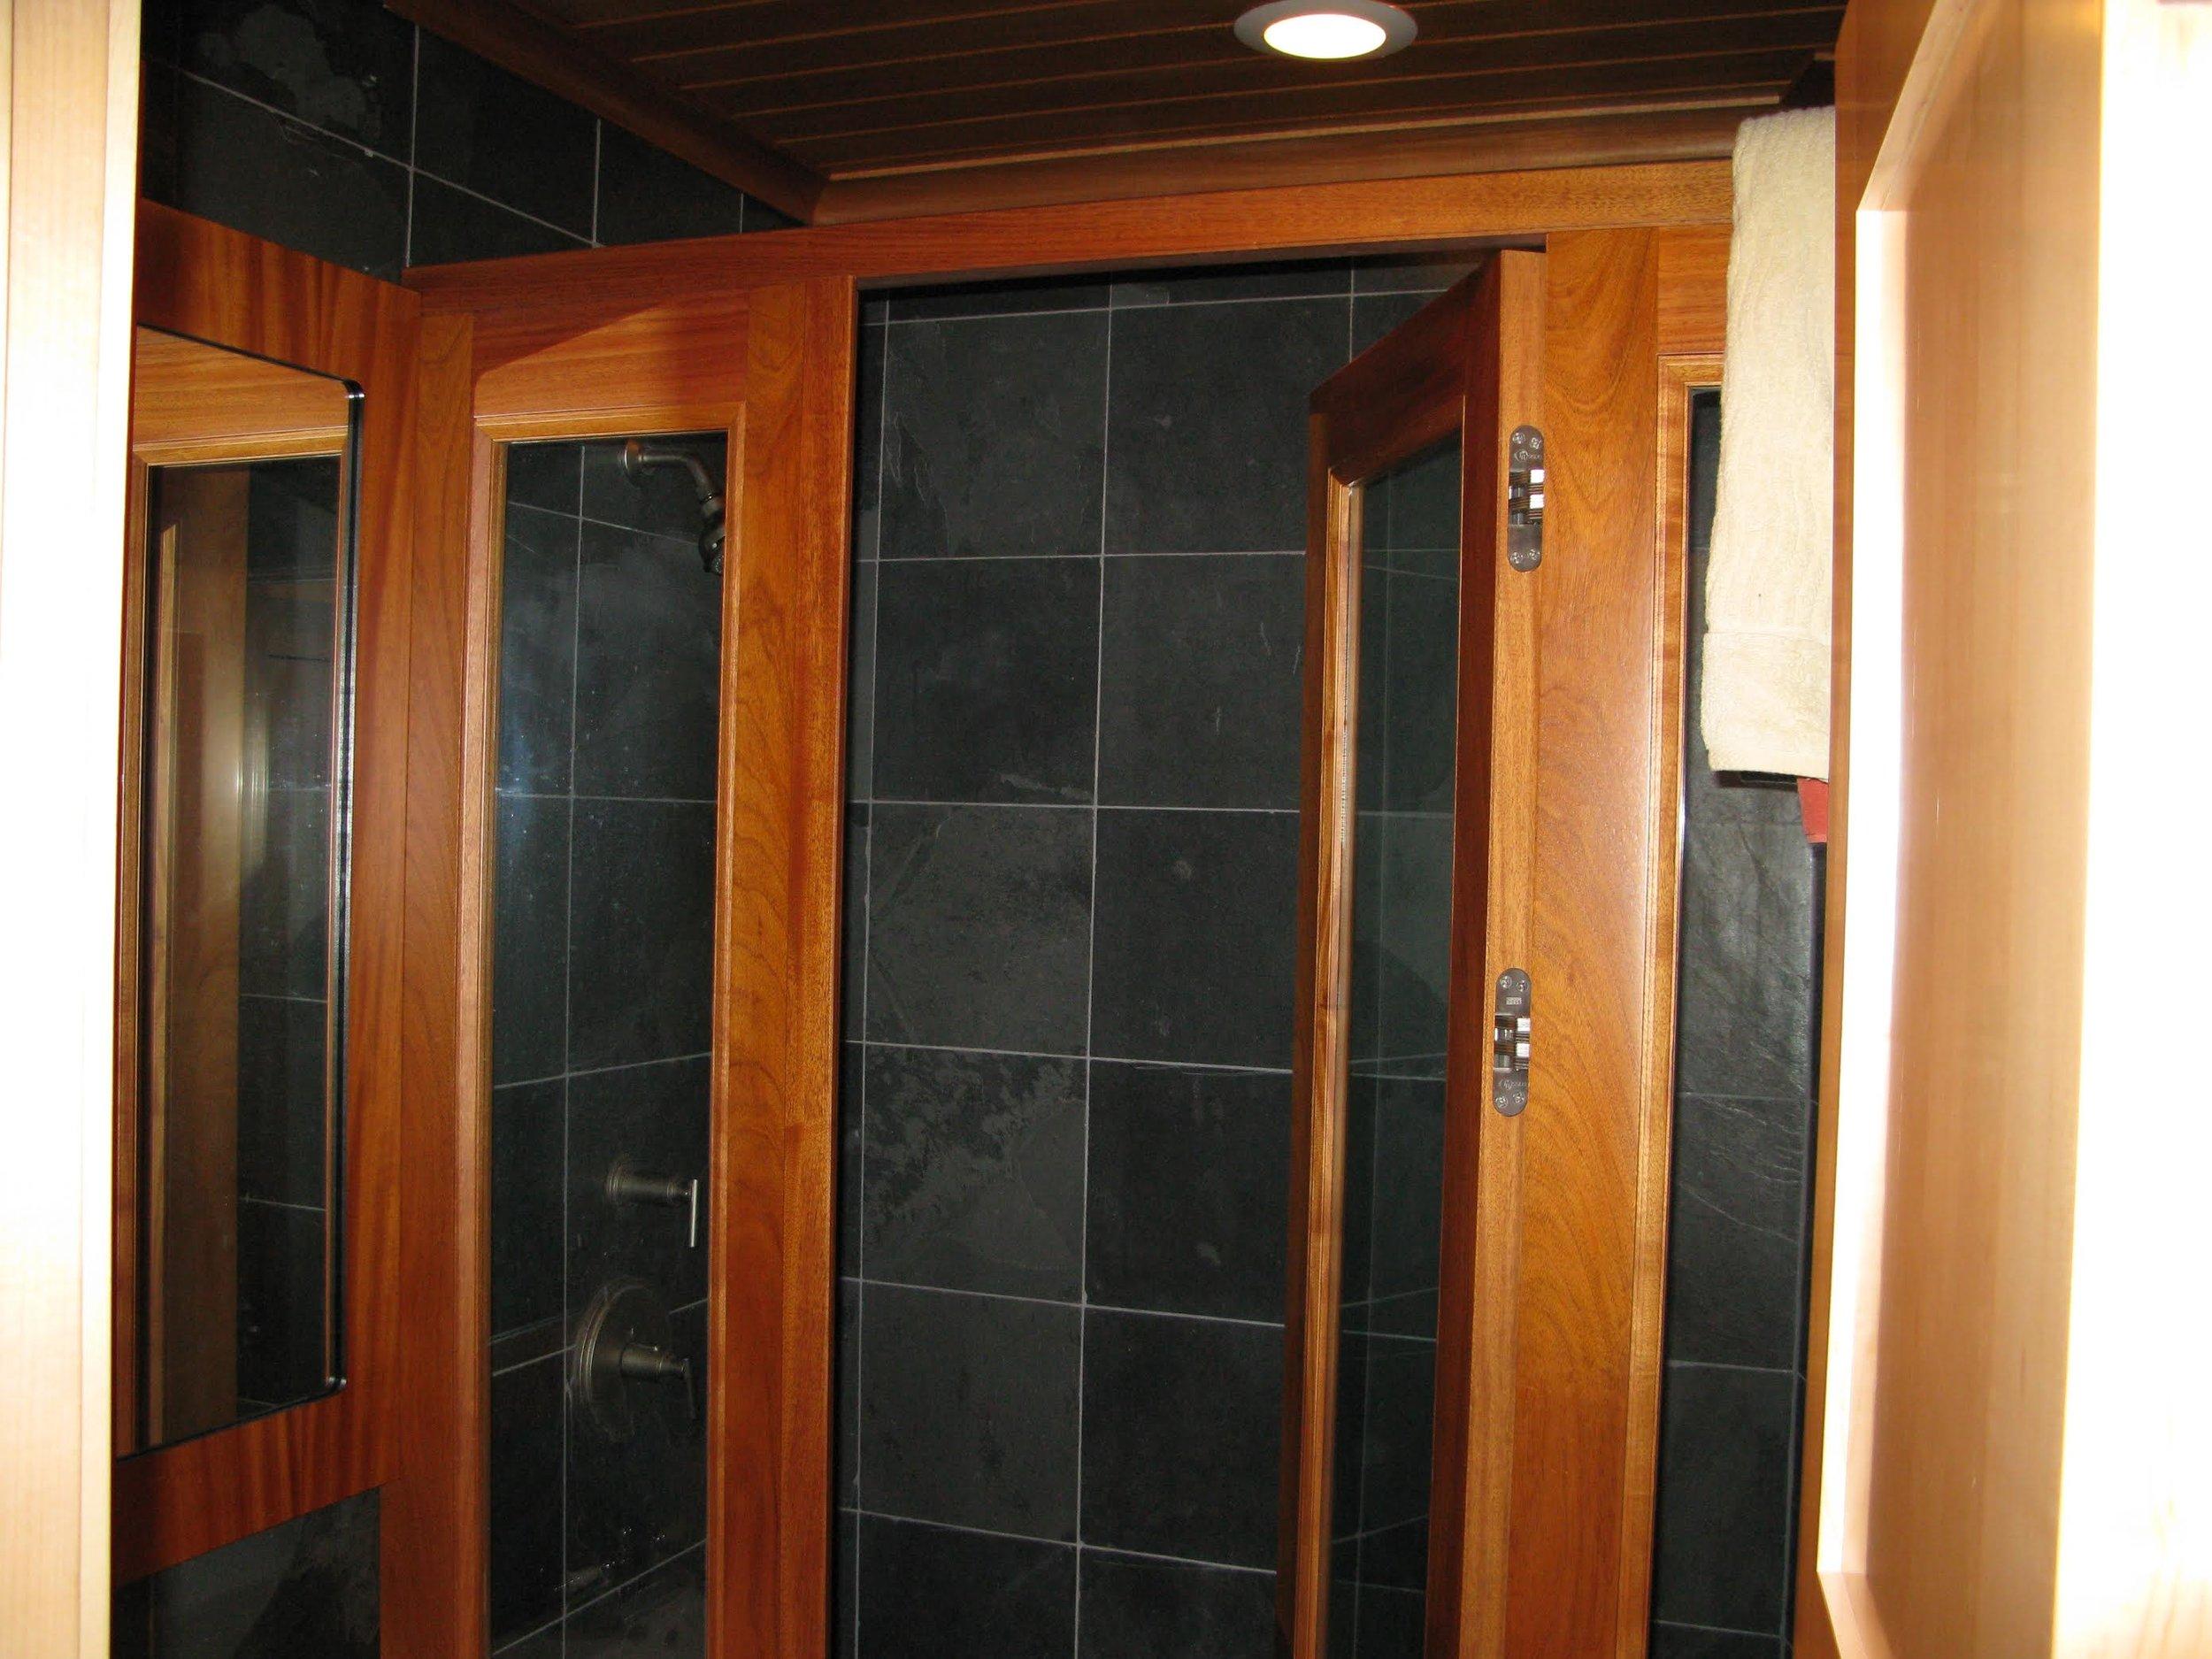 Mahogany Bathroom: ceiling, moulding, mirror frame & medicine cabinet